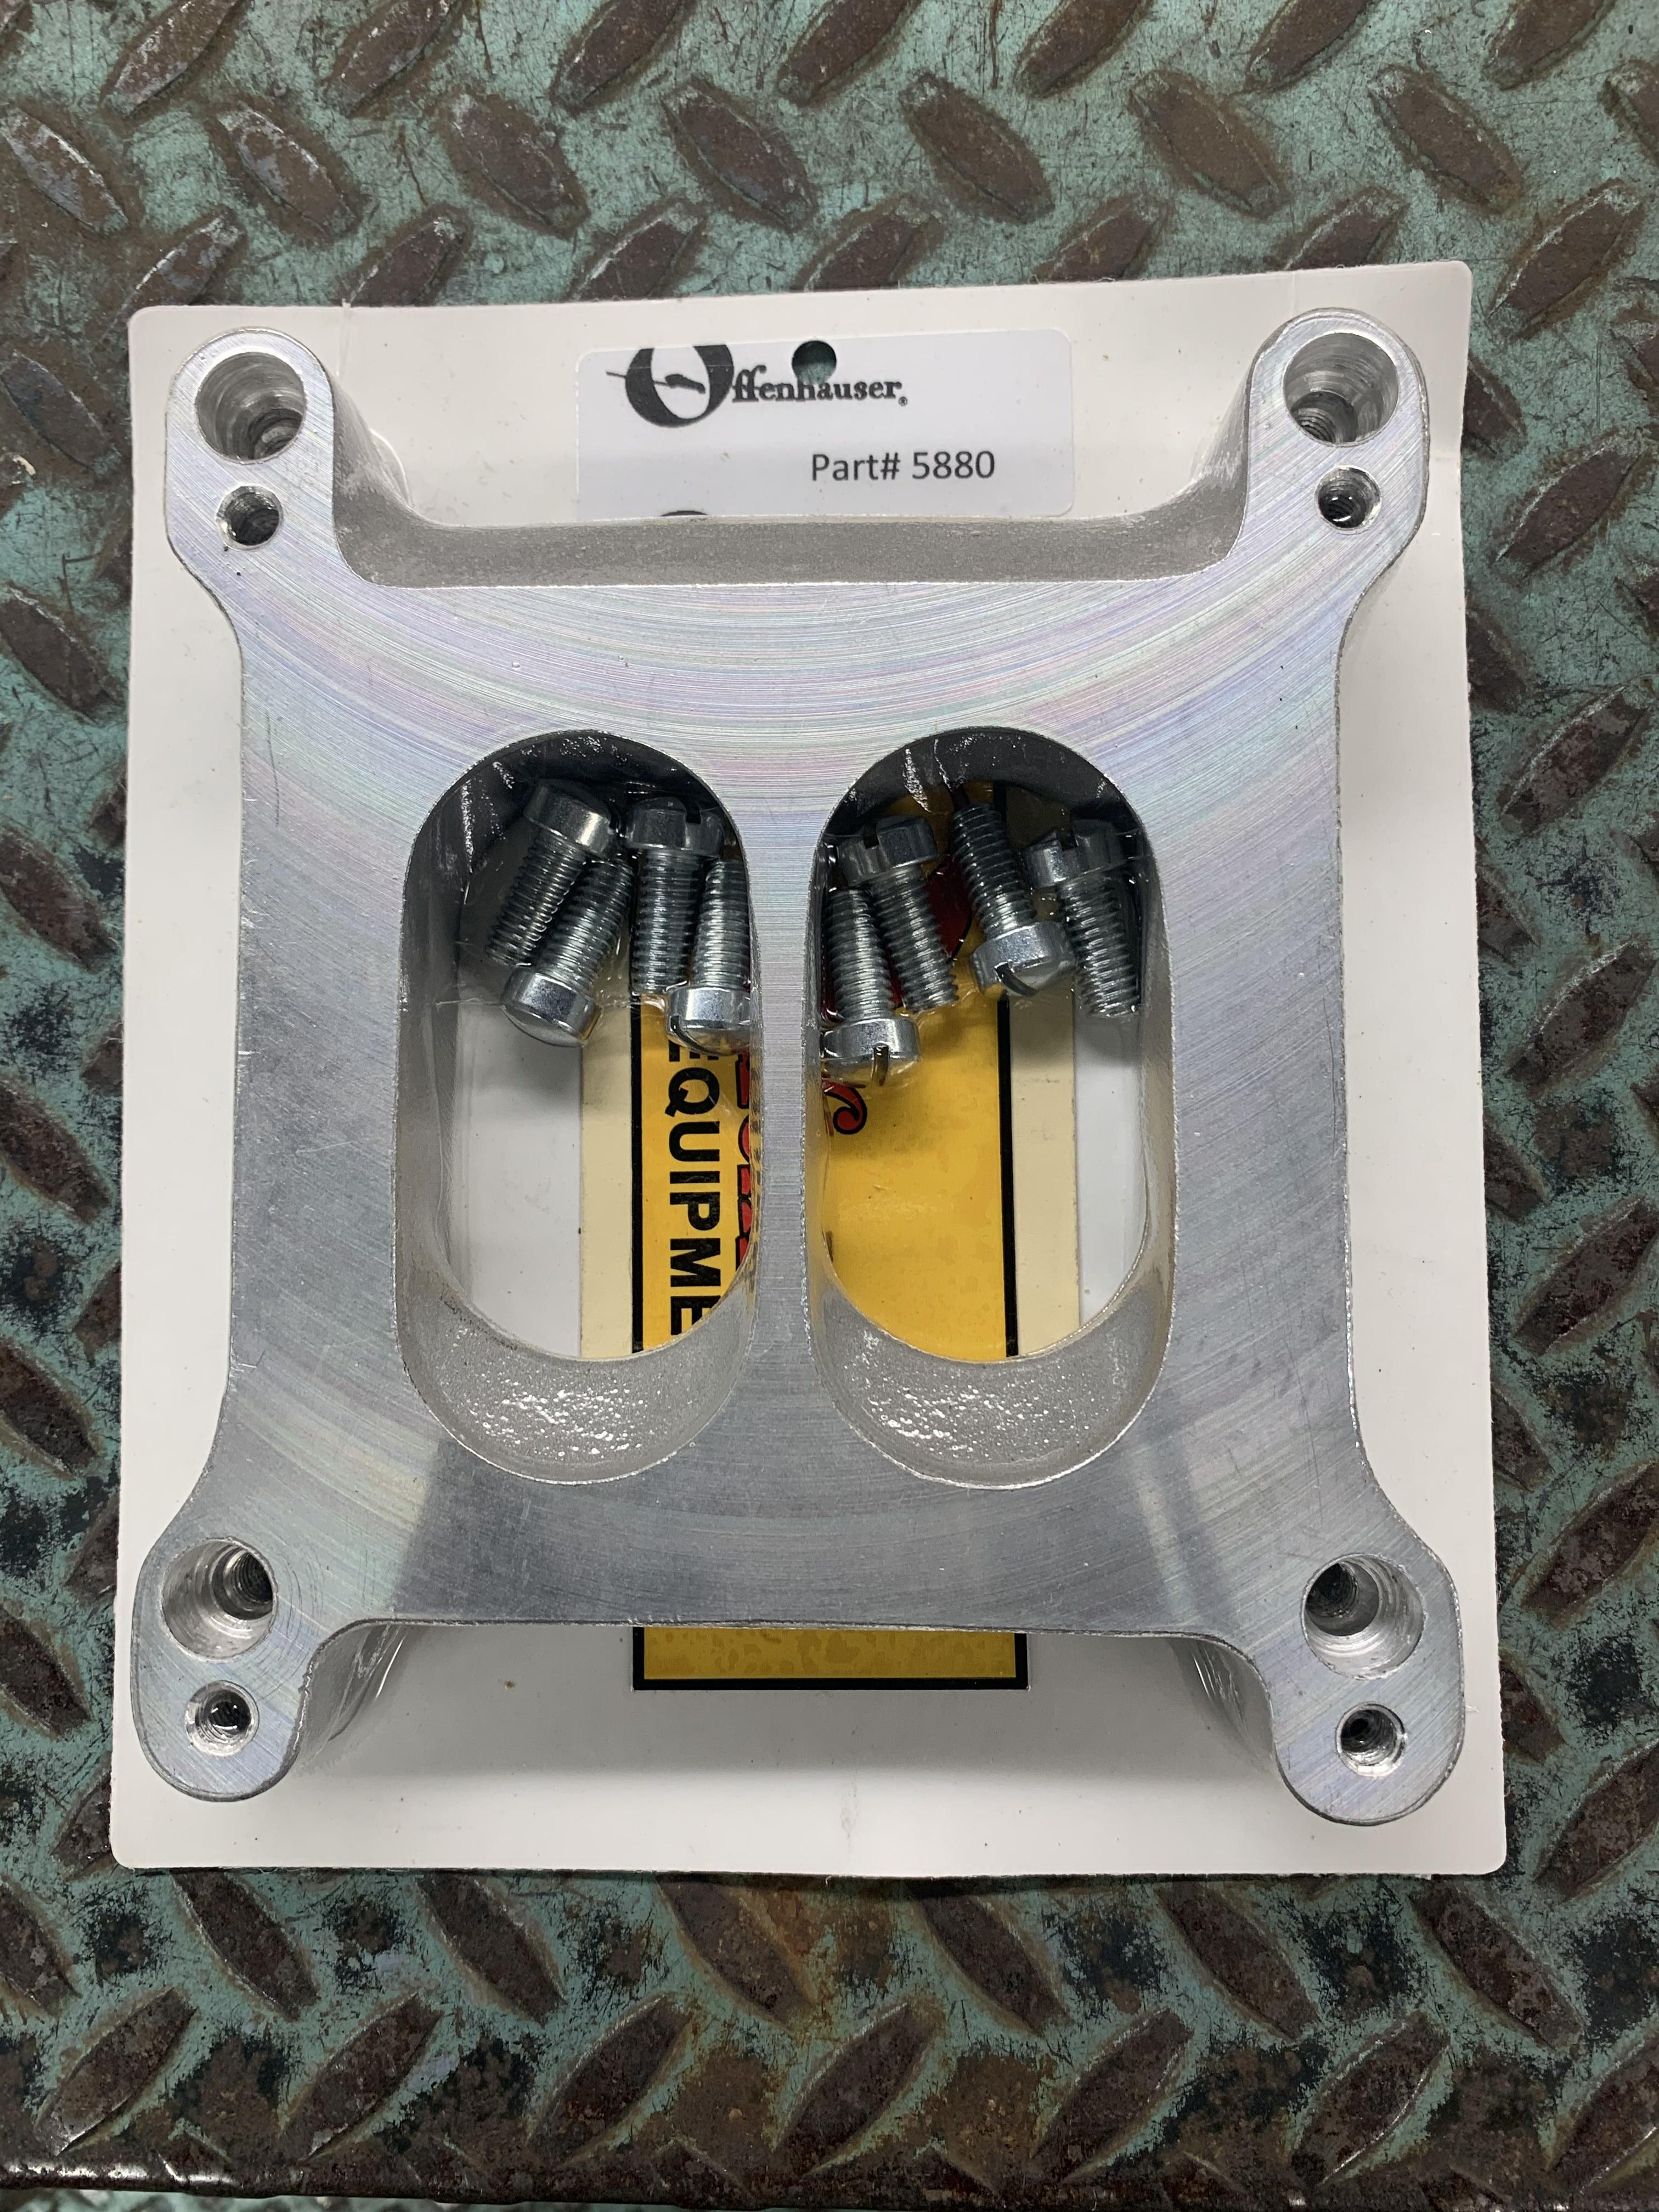 Offenhauser 5880 Carburetor Adapter